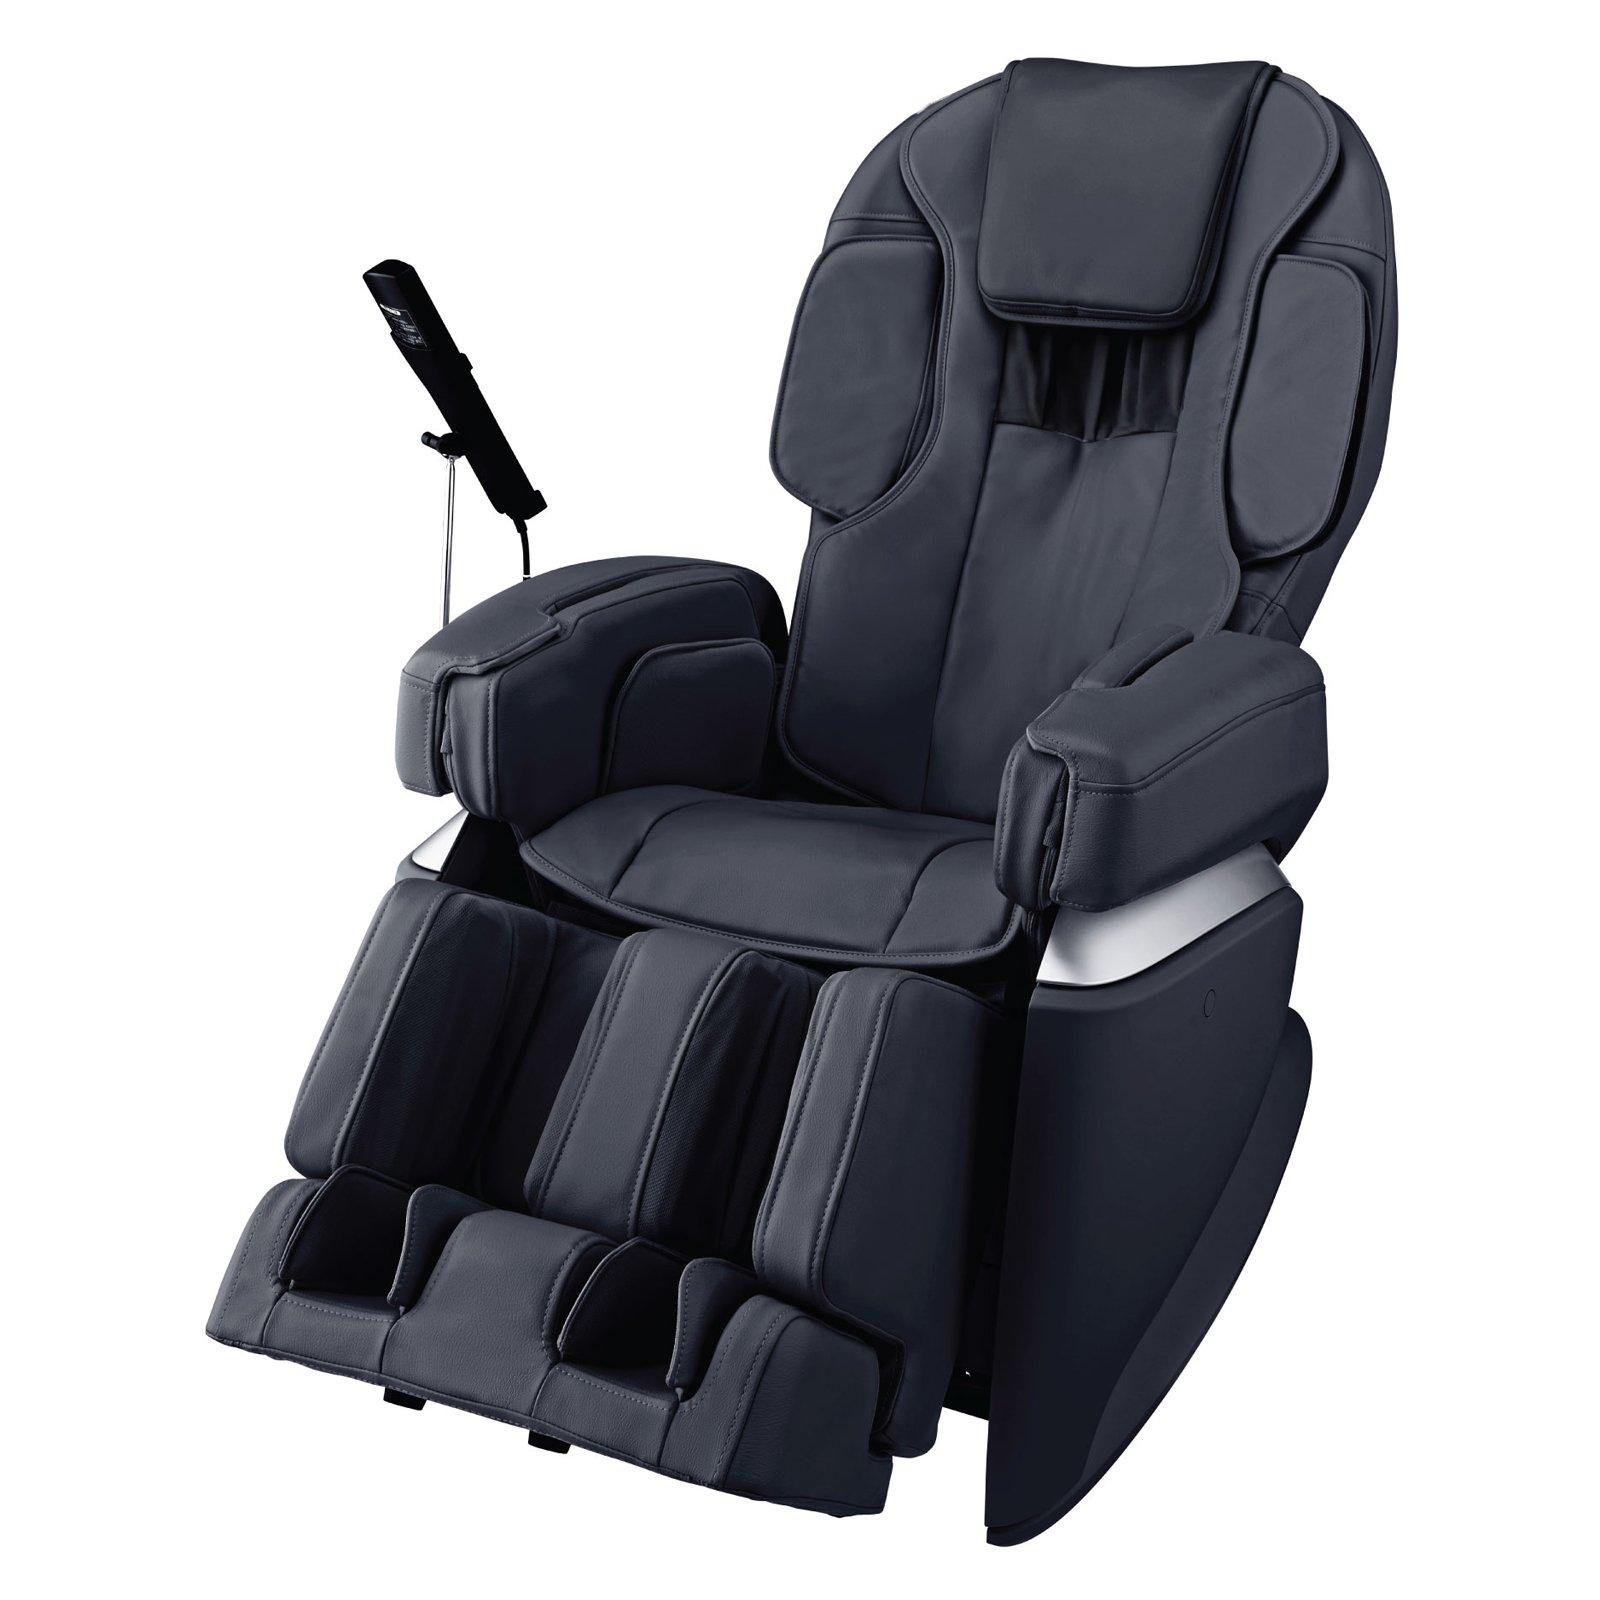 Osaki Japan 4.0 Premium Humanistic Massage Chair Black